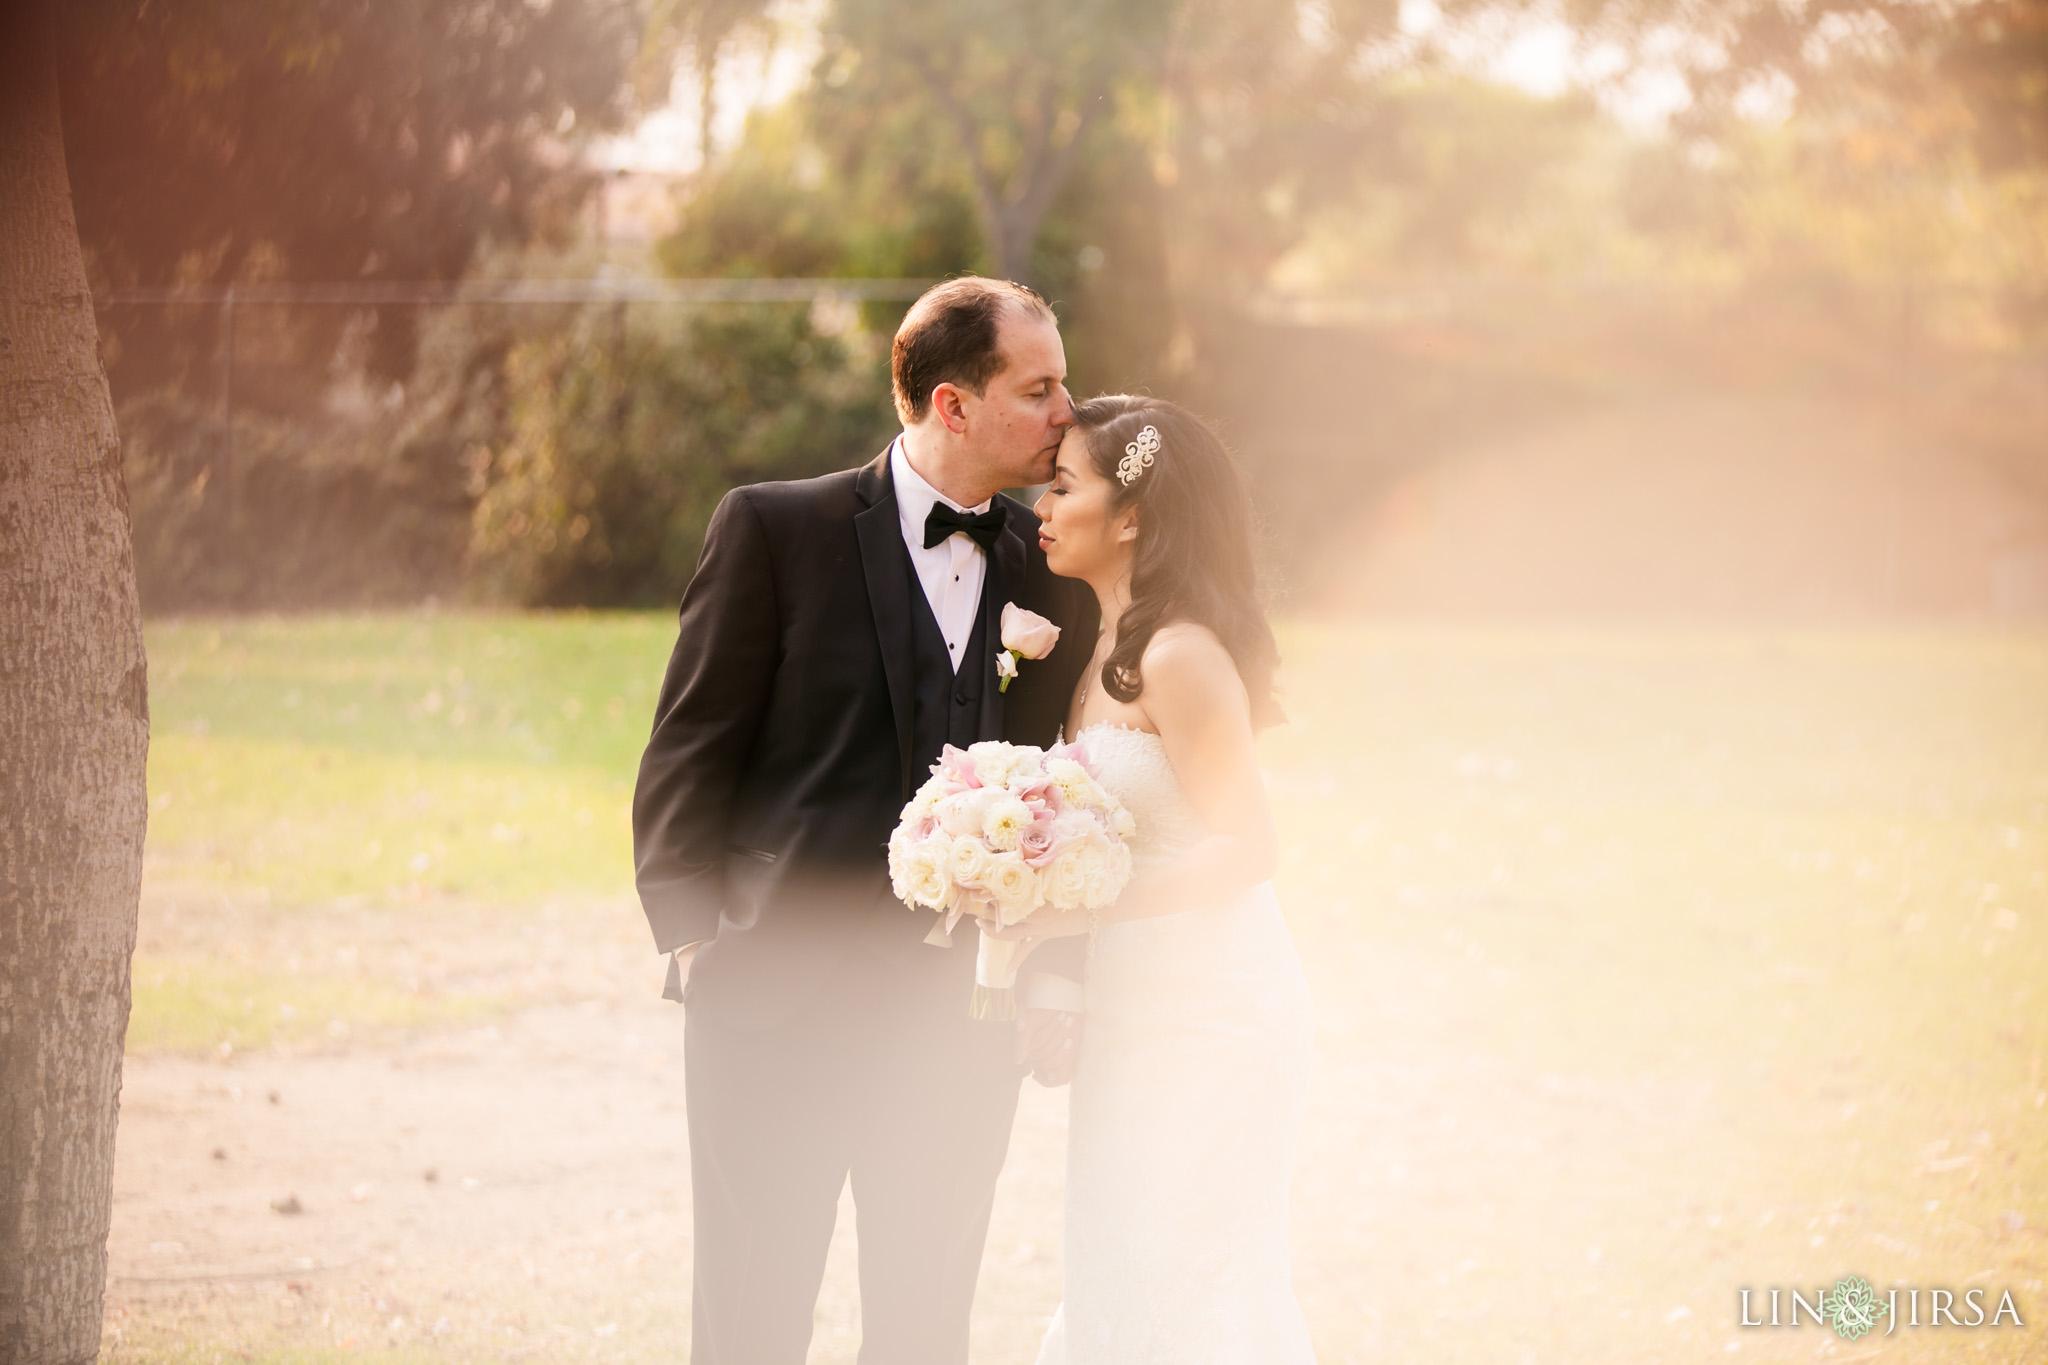 14 vertigo banquet hall glendale wedding photography